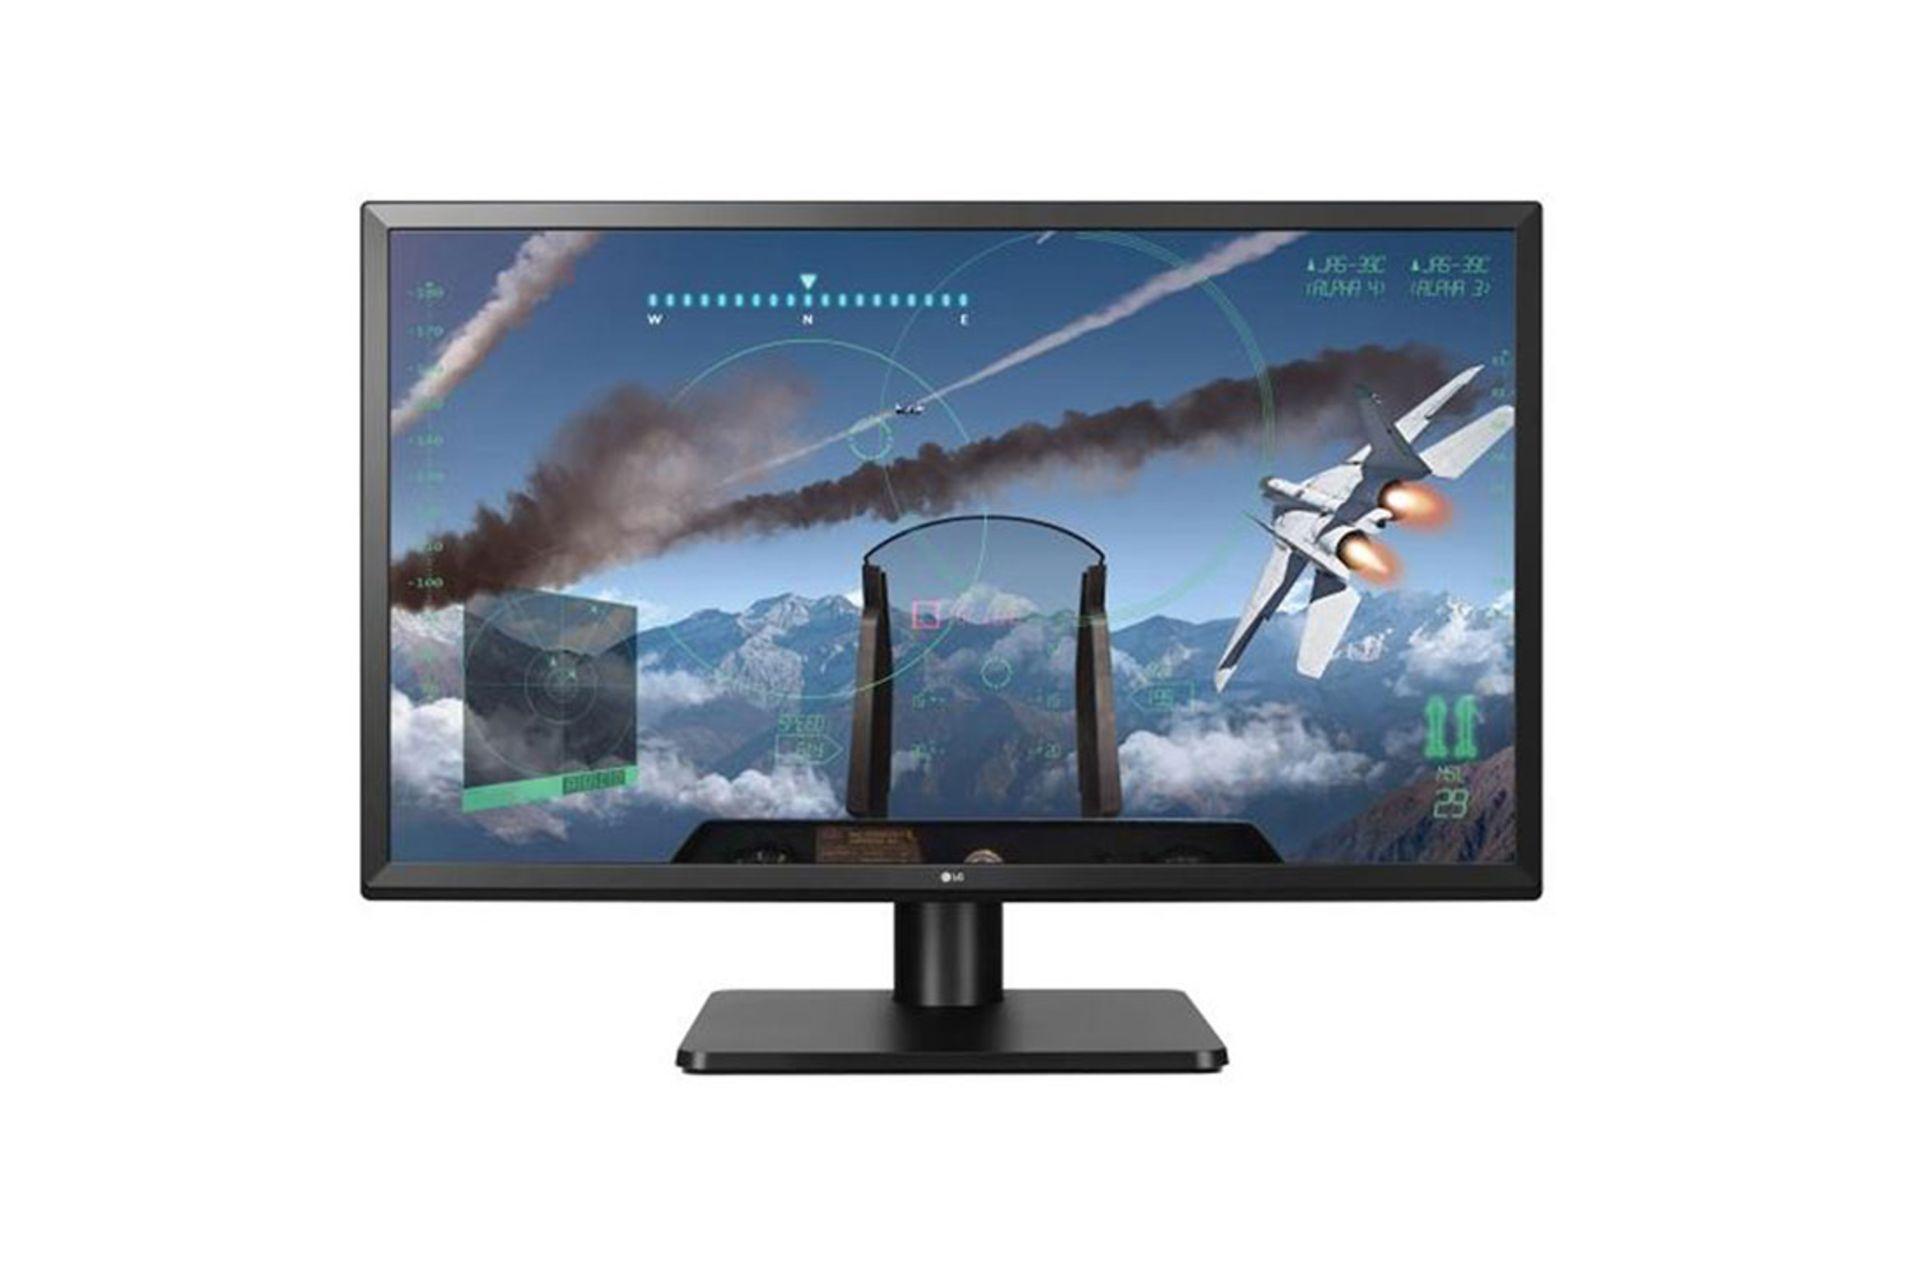 Lot 16022 - V Grade A LG 27 Inch 4K UHD IPS LED MONITOR - HDMI X 2, DISPLAY PORT X 1 27UD58P-B